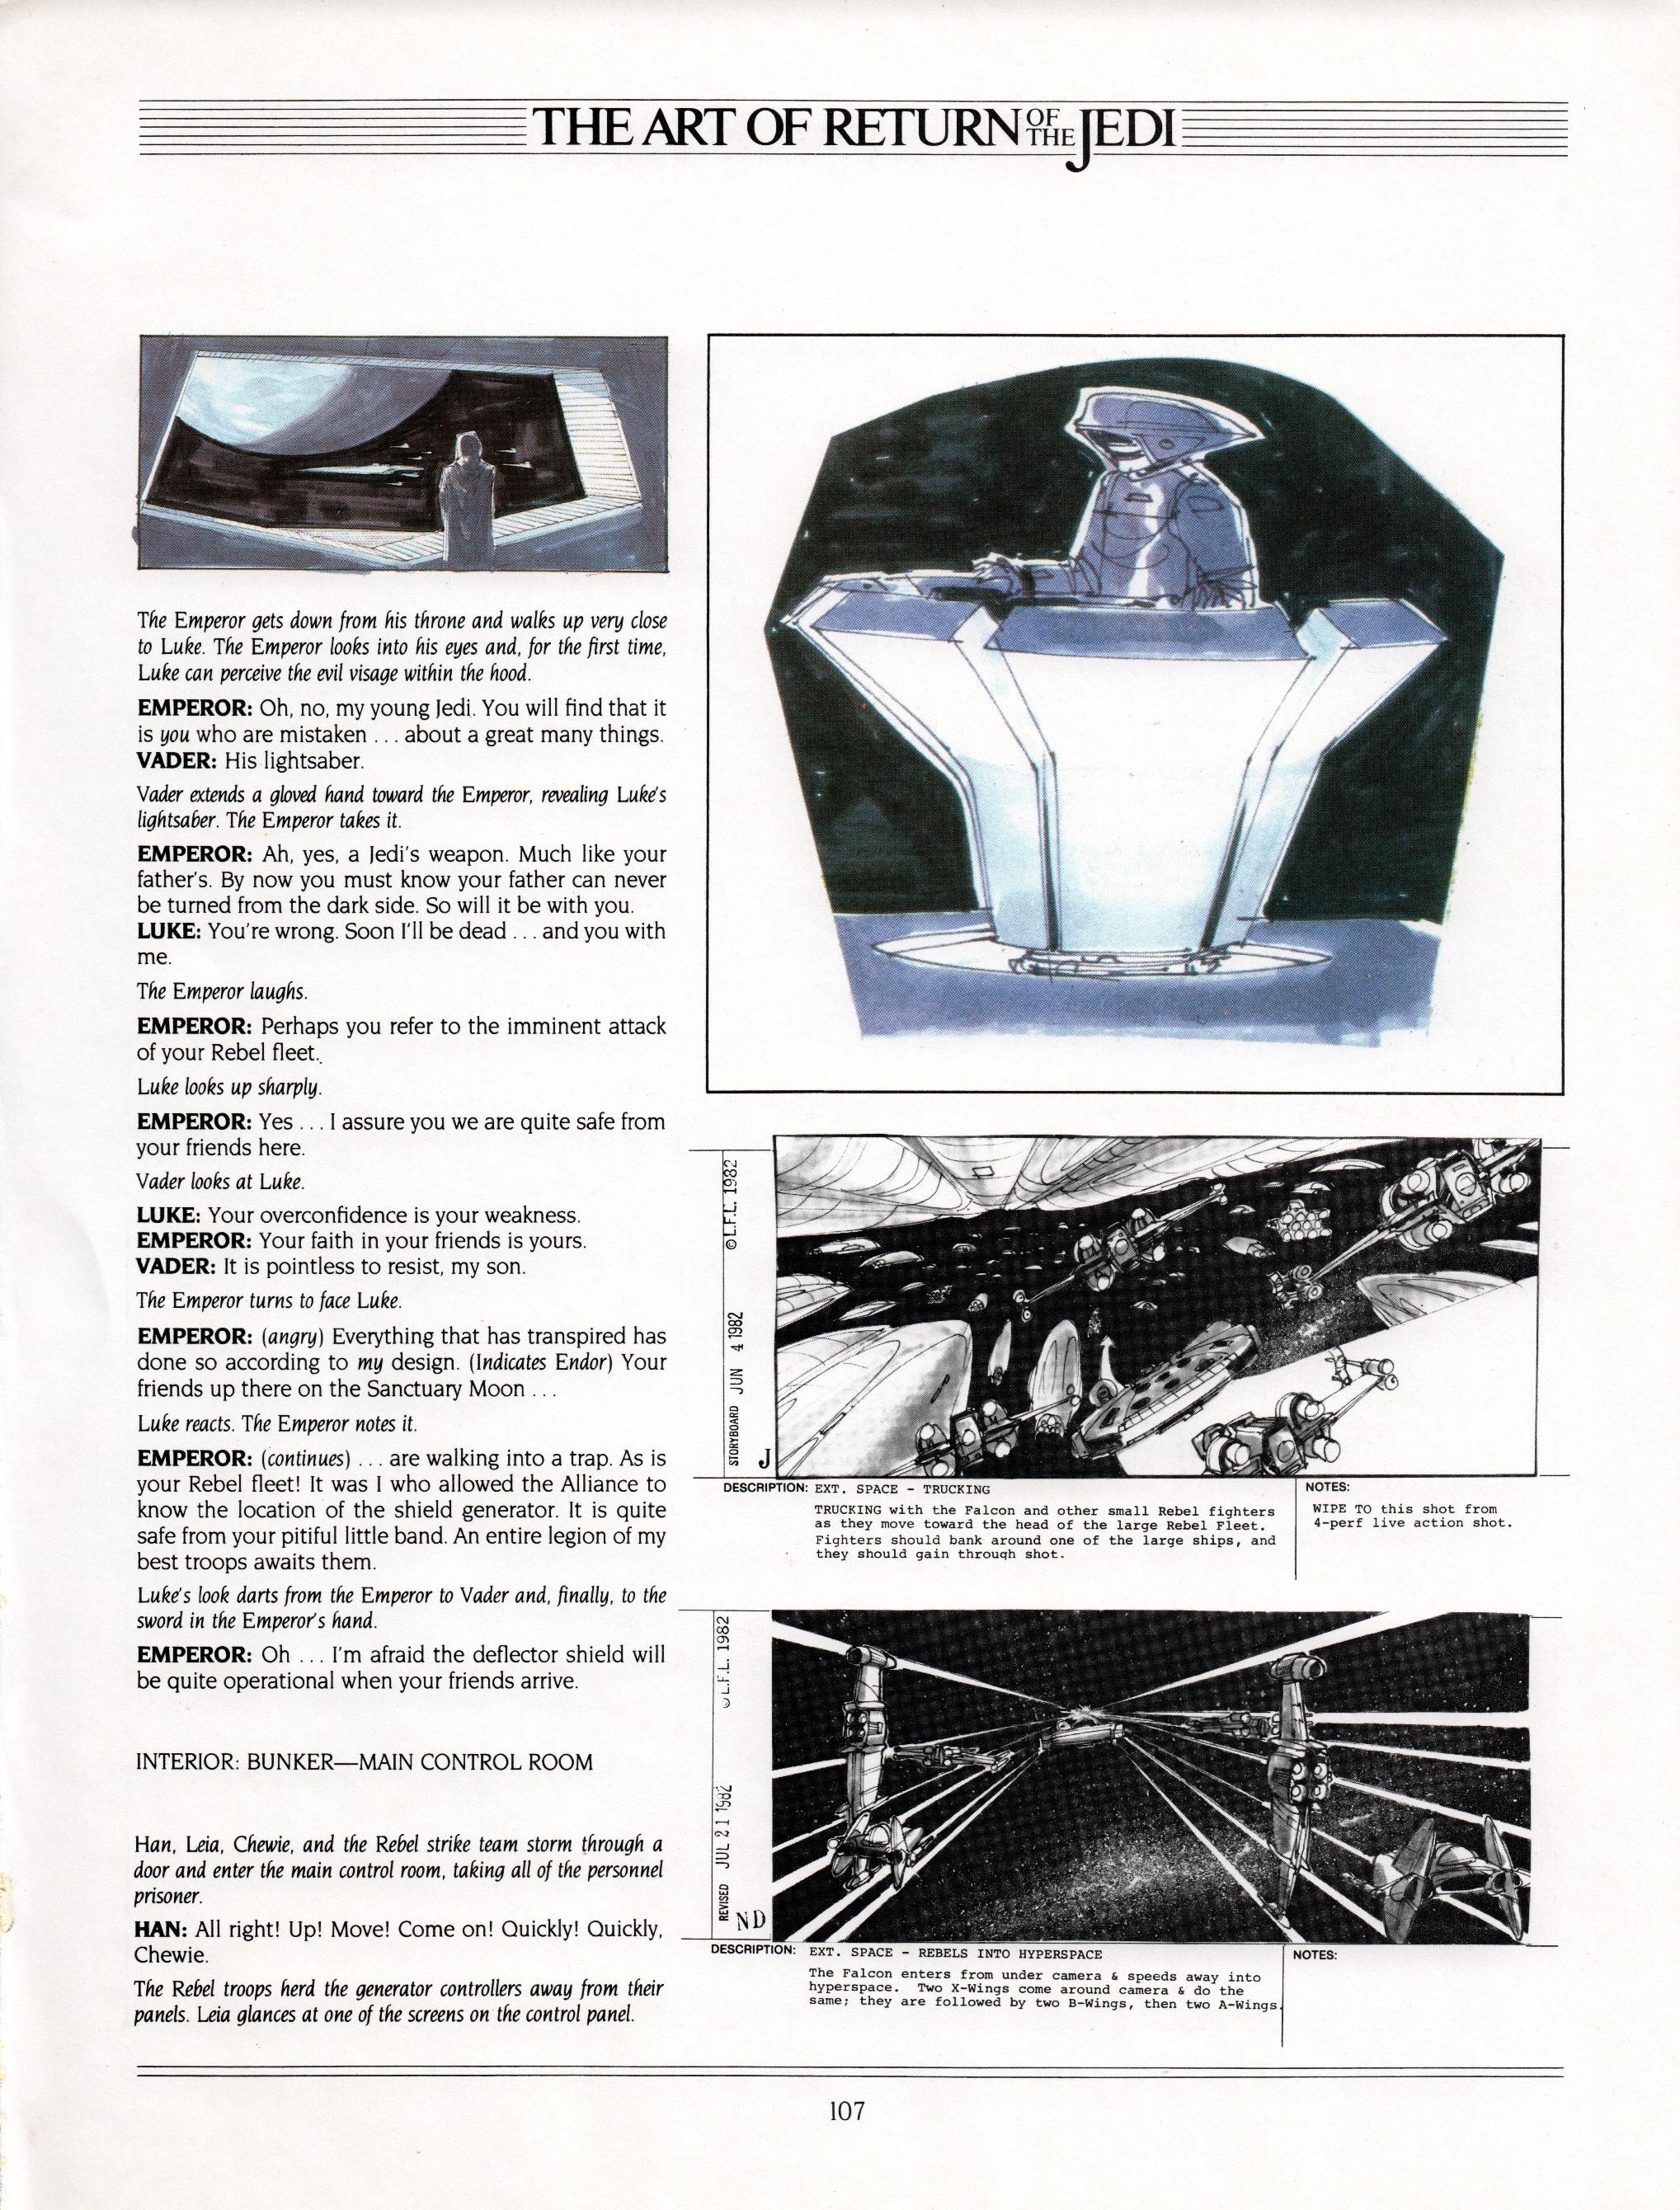 Art of Return of the Jedi (b0bafett_Empire)-p107